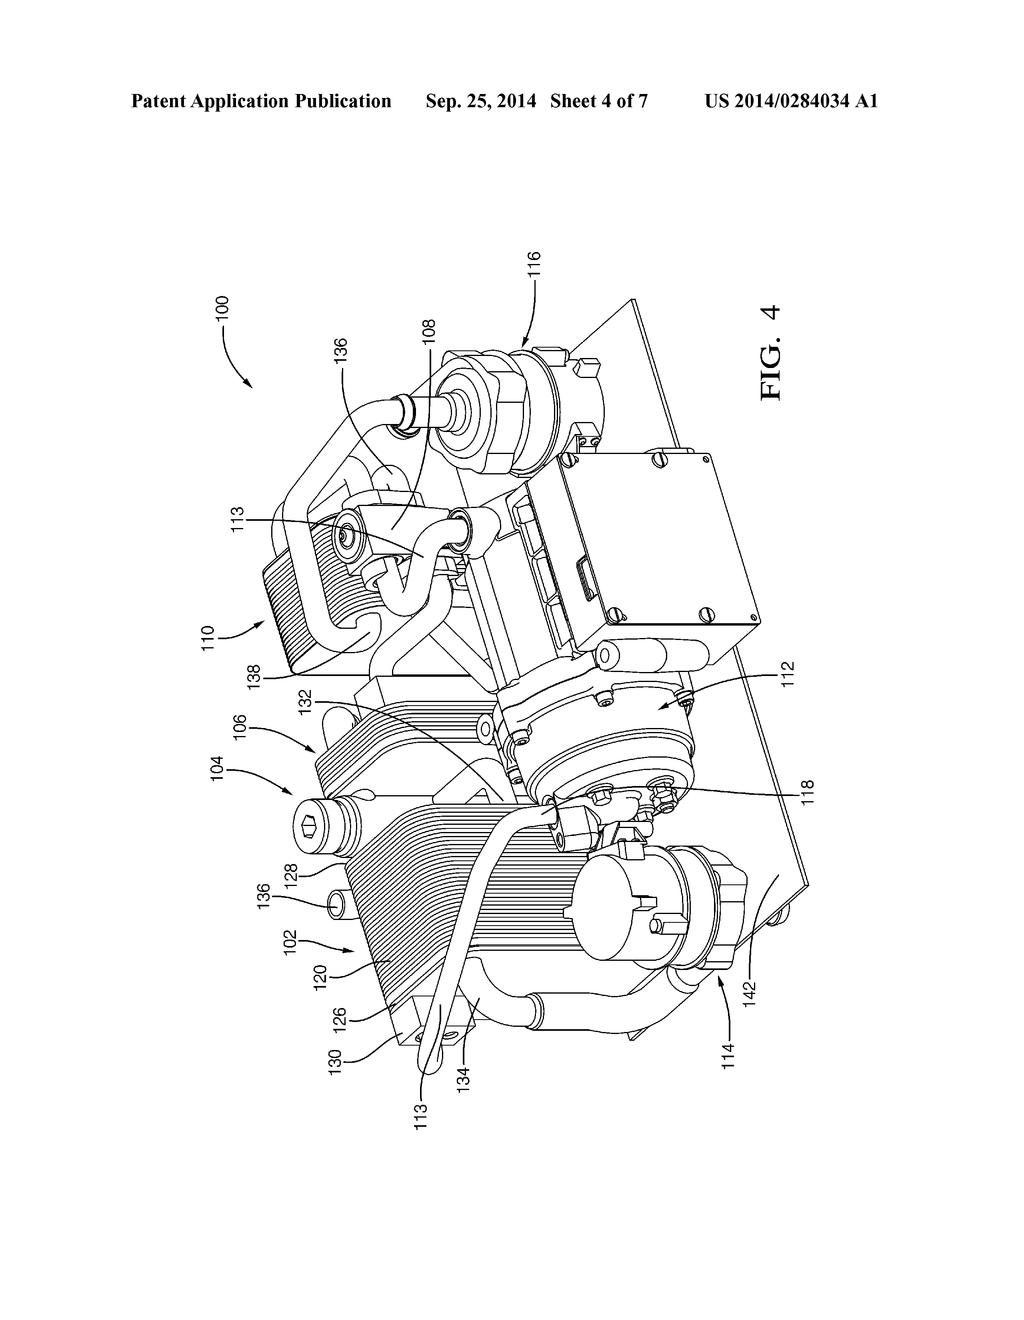 Honda fury diagram mazda bongo wiring diagram at w freeautoresponder co